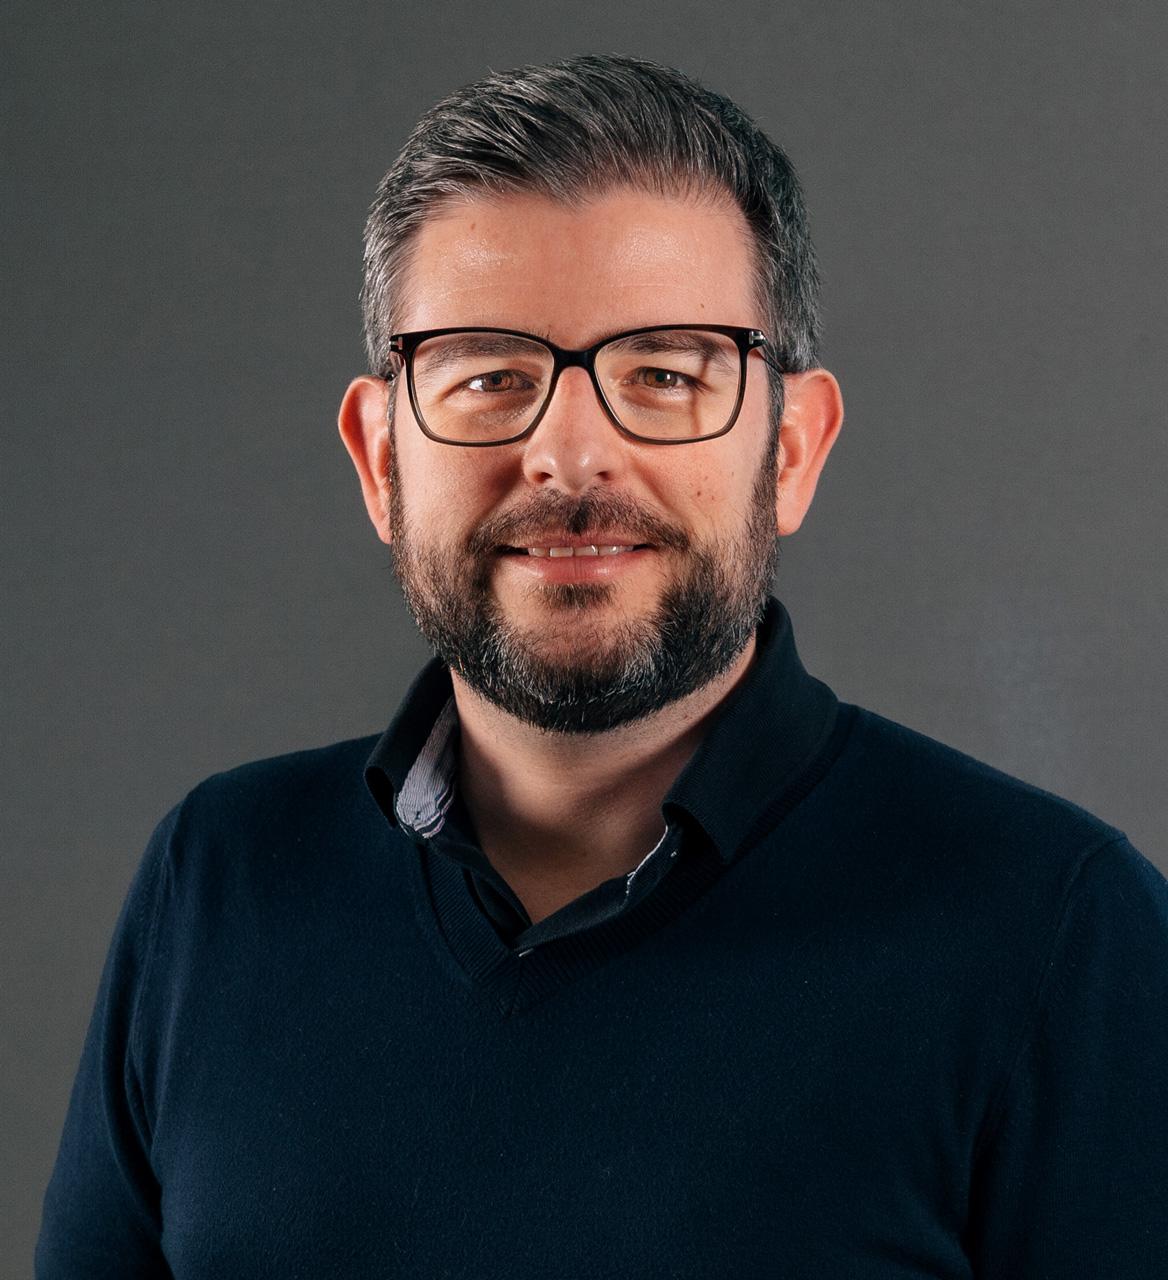 Sergio Herencias - Portrait